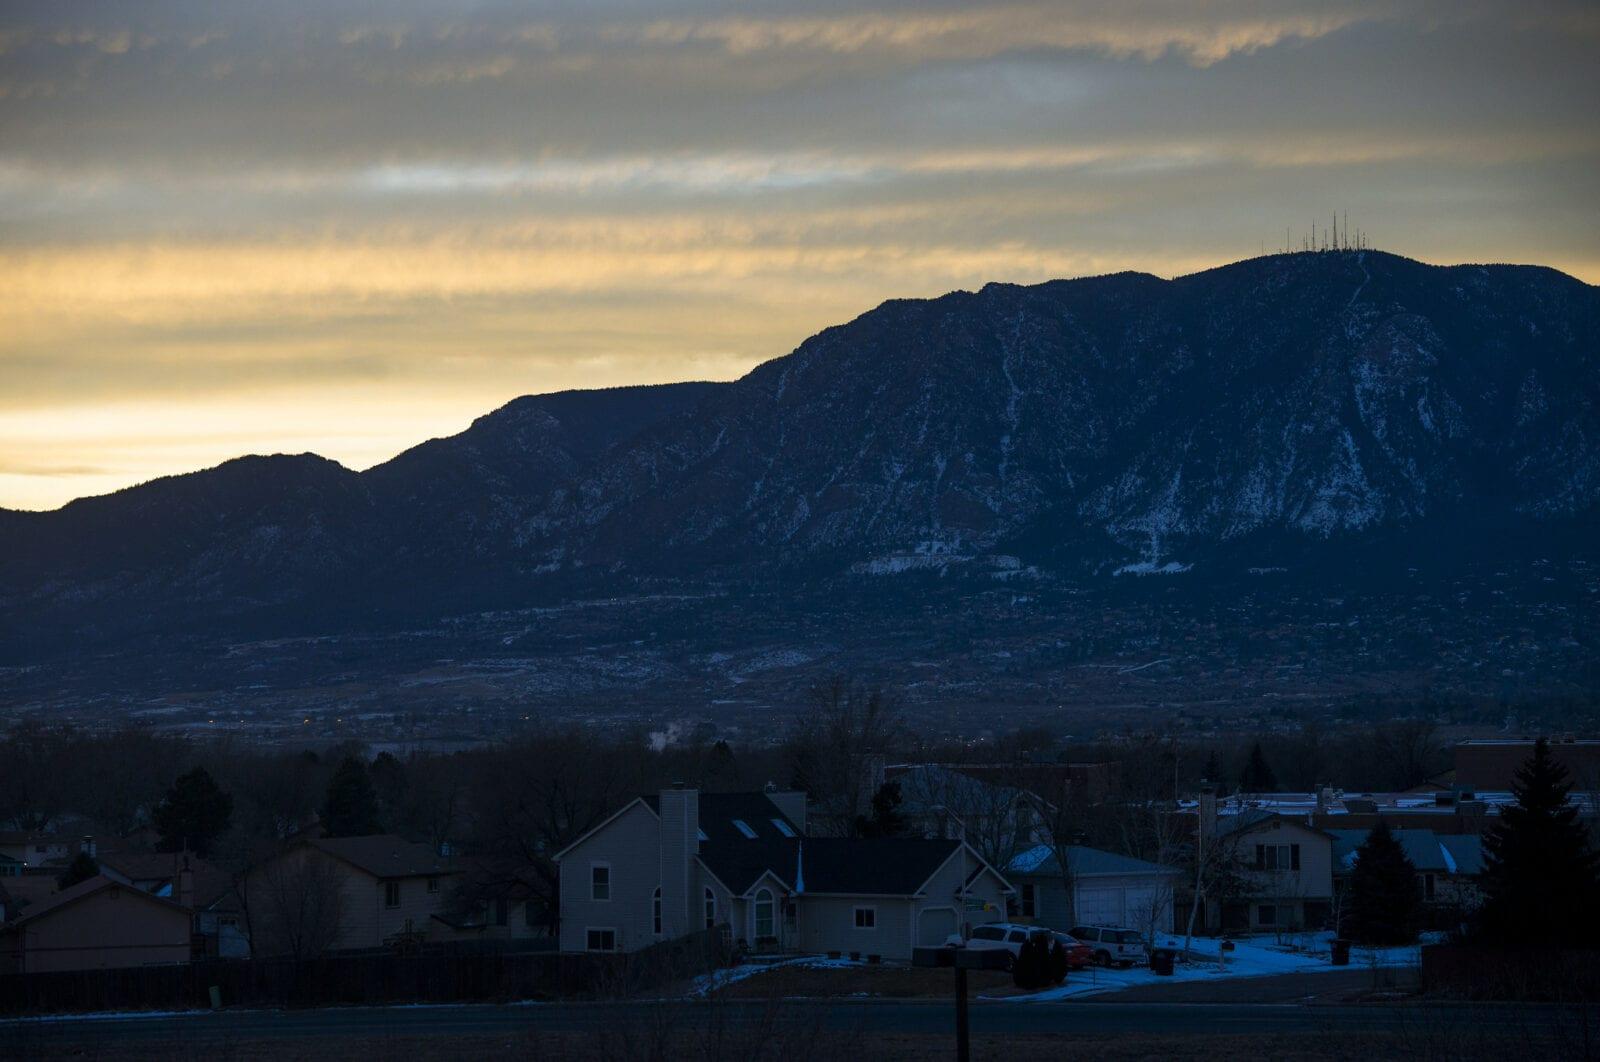 Image of the Cheyenne Mountain Complex mountain in Colorado Springs, Colorado